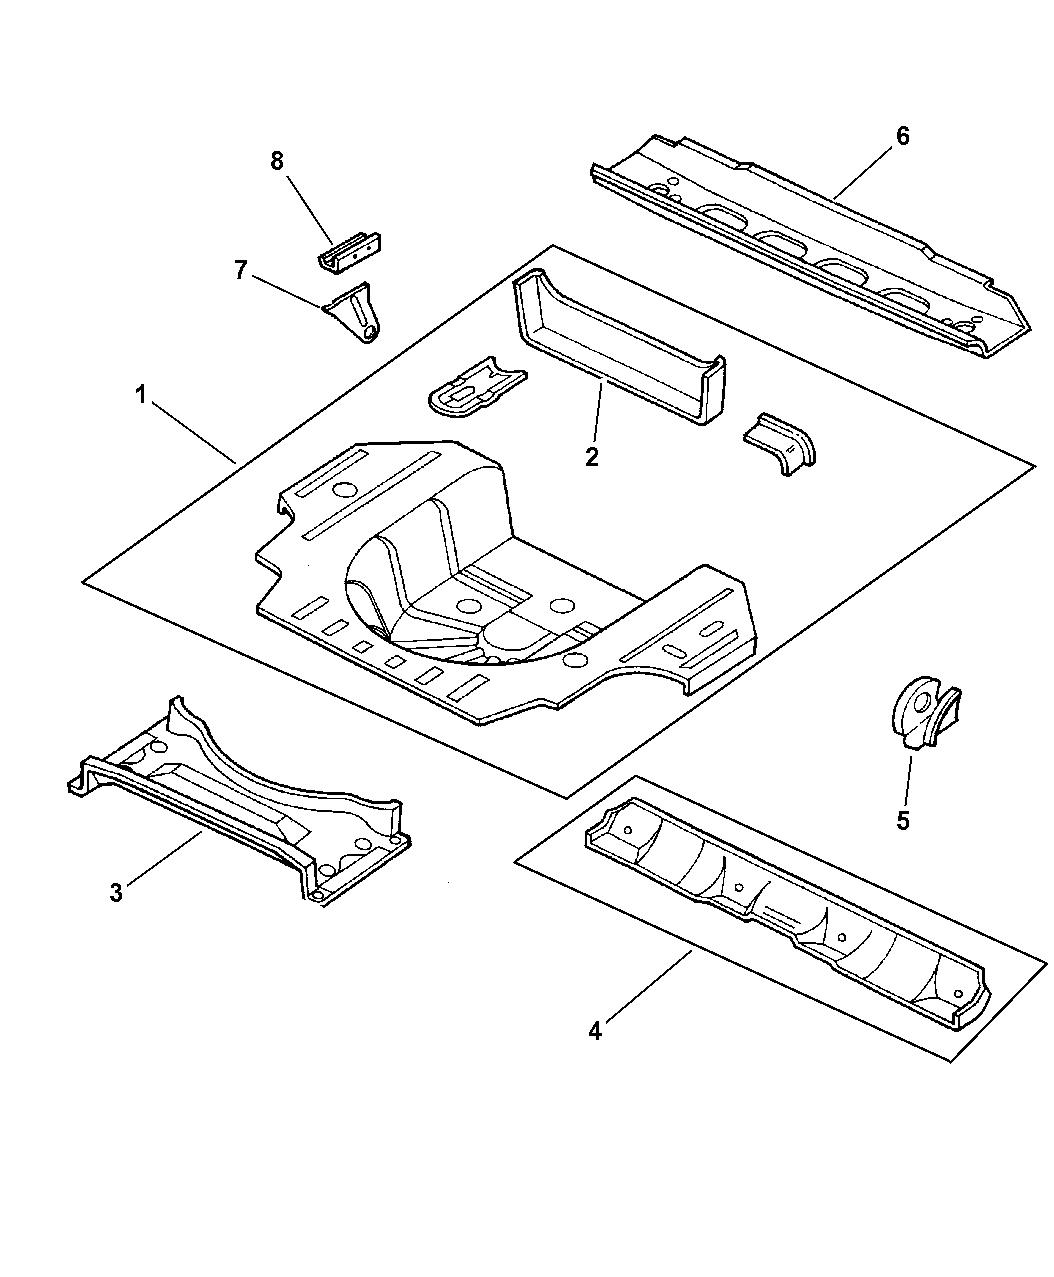 2004 chrysler 300m rear floor pan